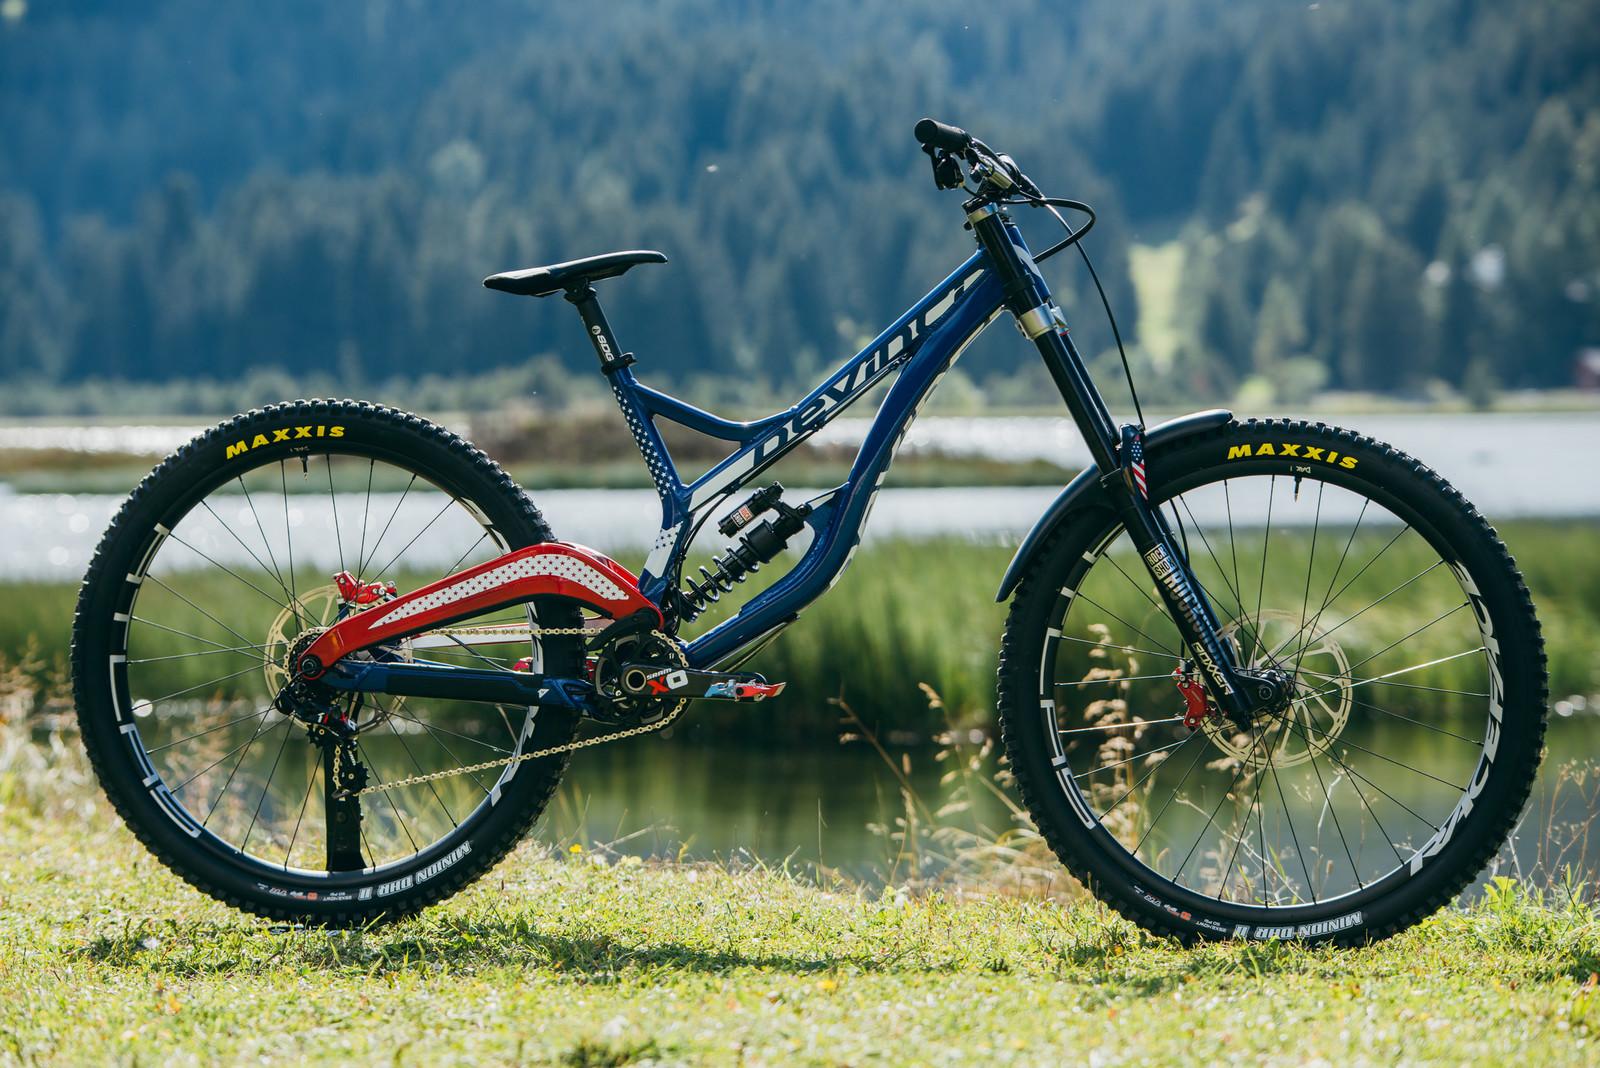 Dak's Devinci Wilson 29 - WORLD CHAMPS BIKES - Unior/Devinci Factory Racing - Mountain Biking Pictures - Vital MTB